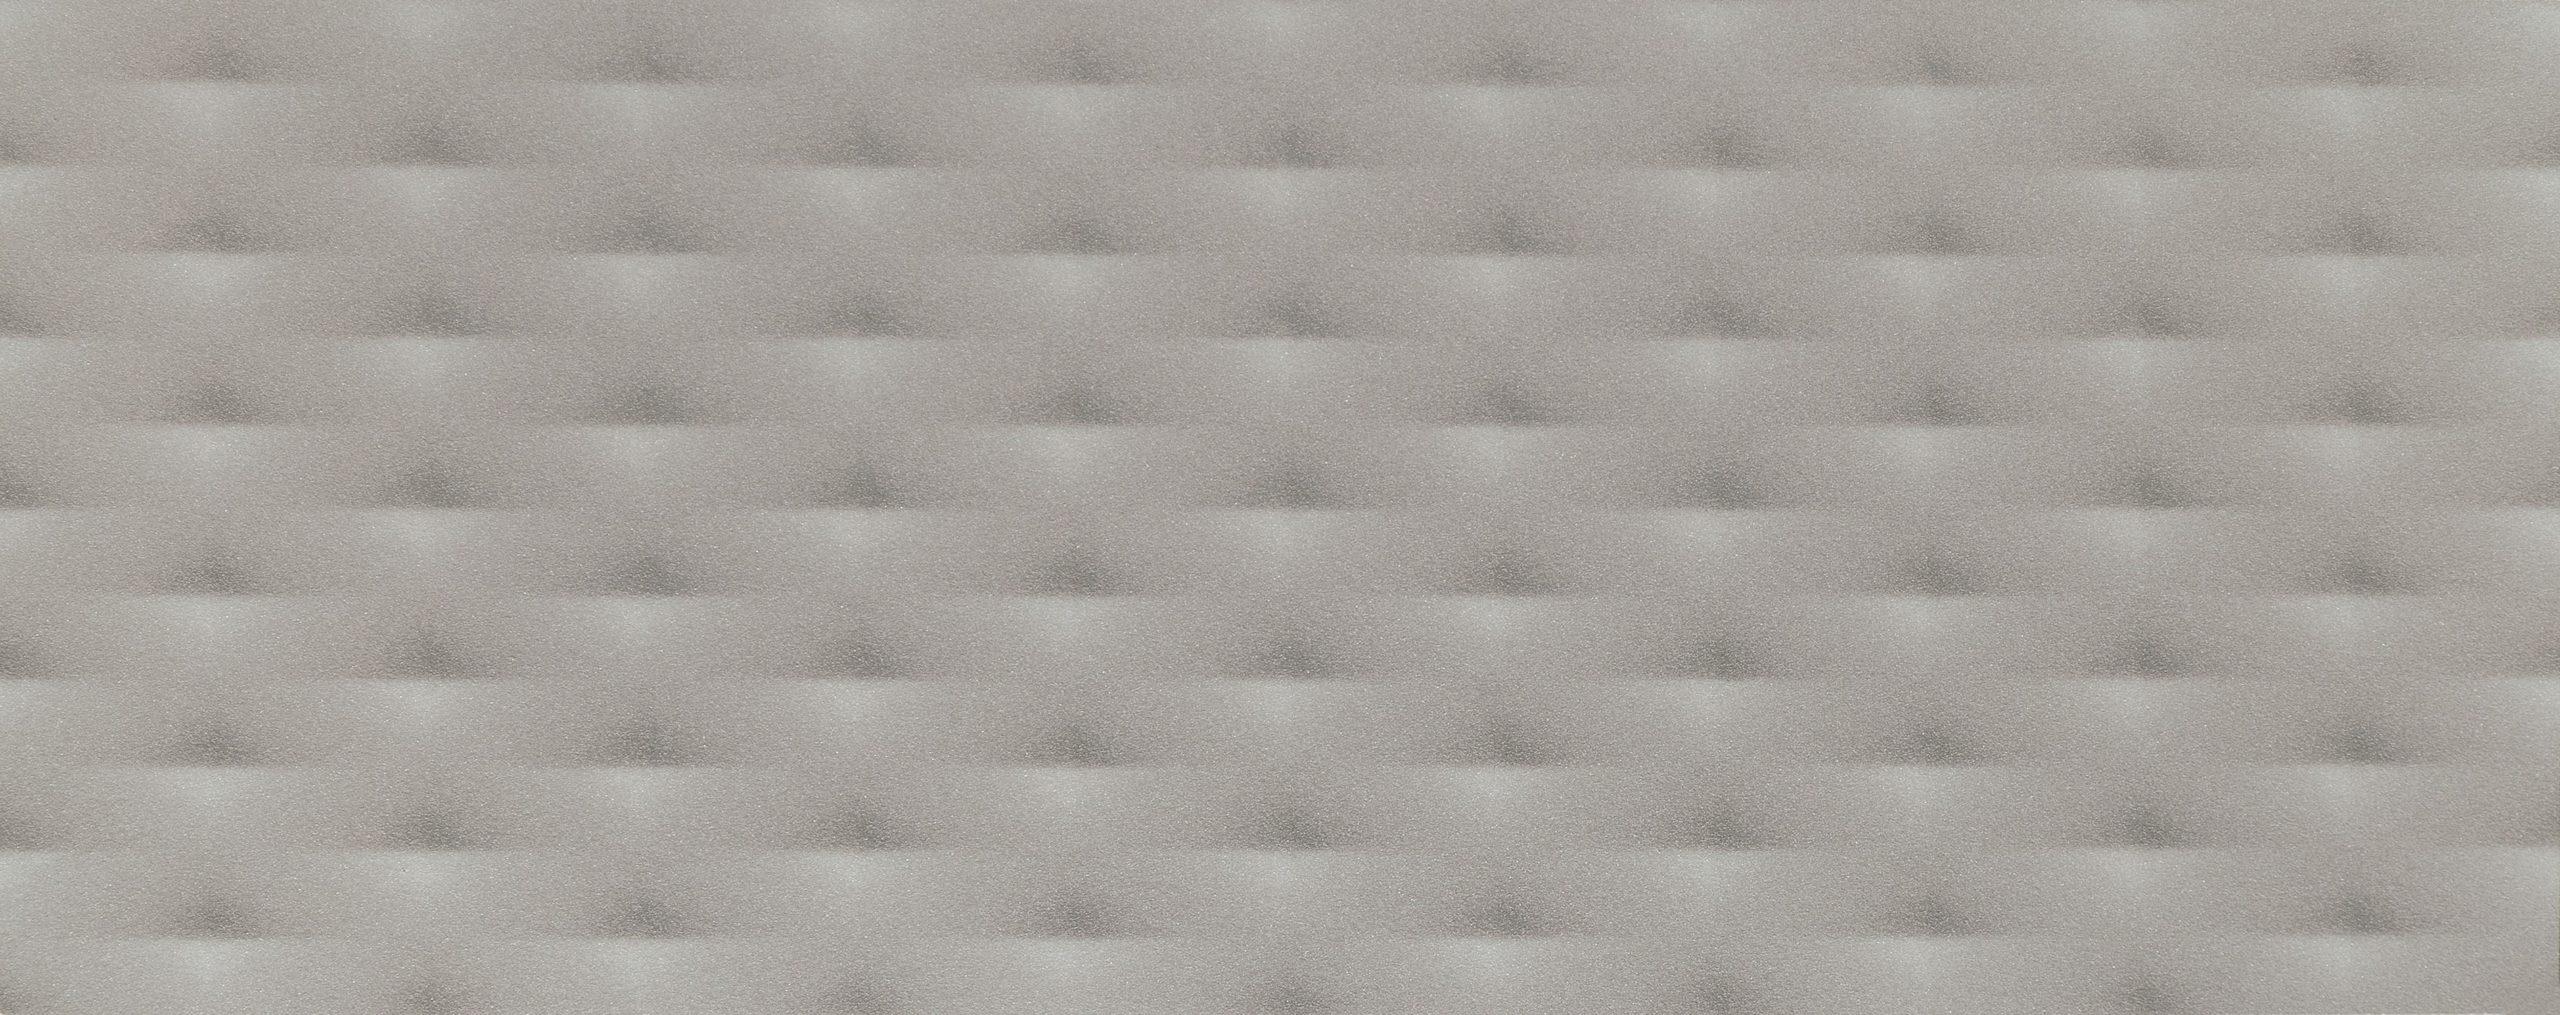 Elementary Graphite Diamond STR 12x30